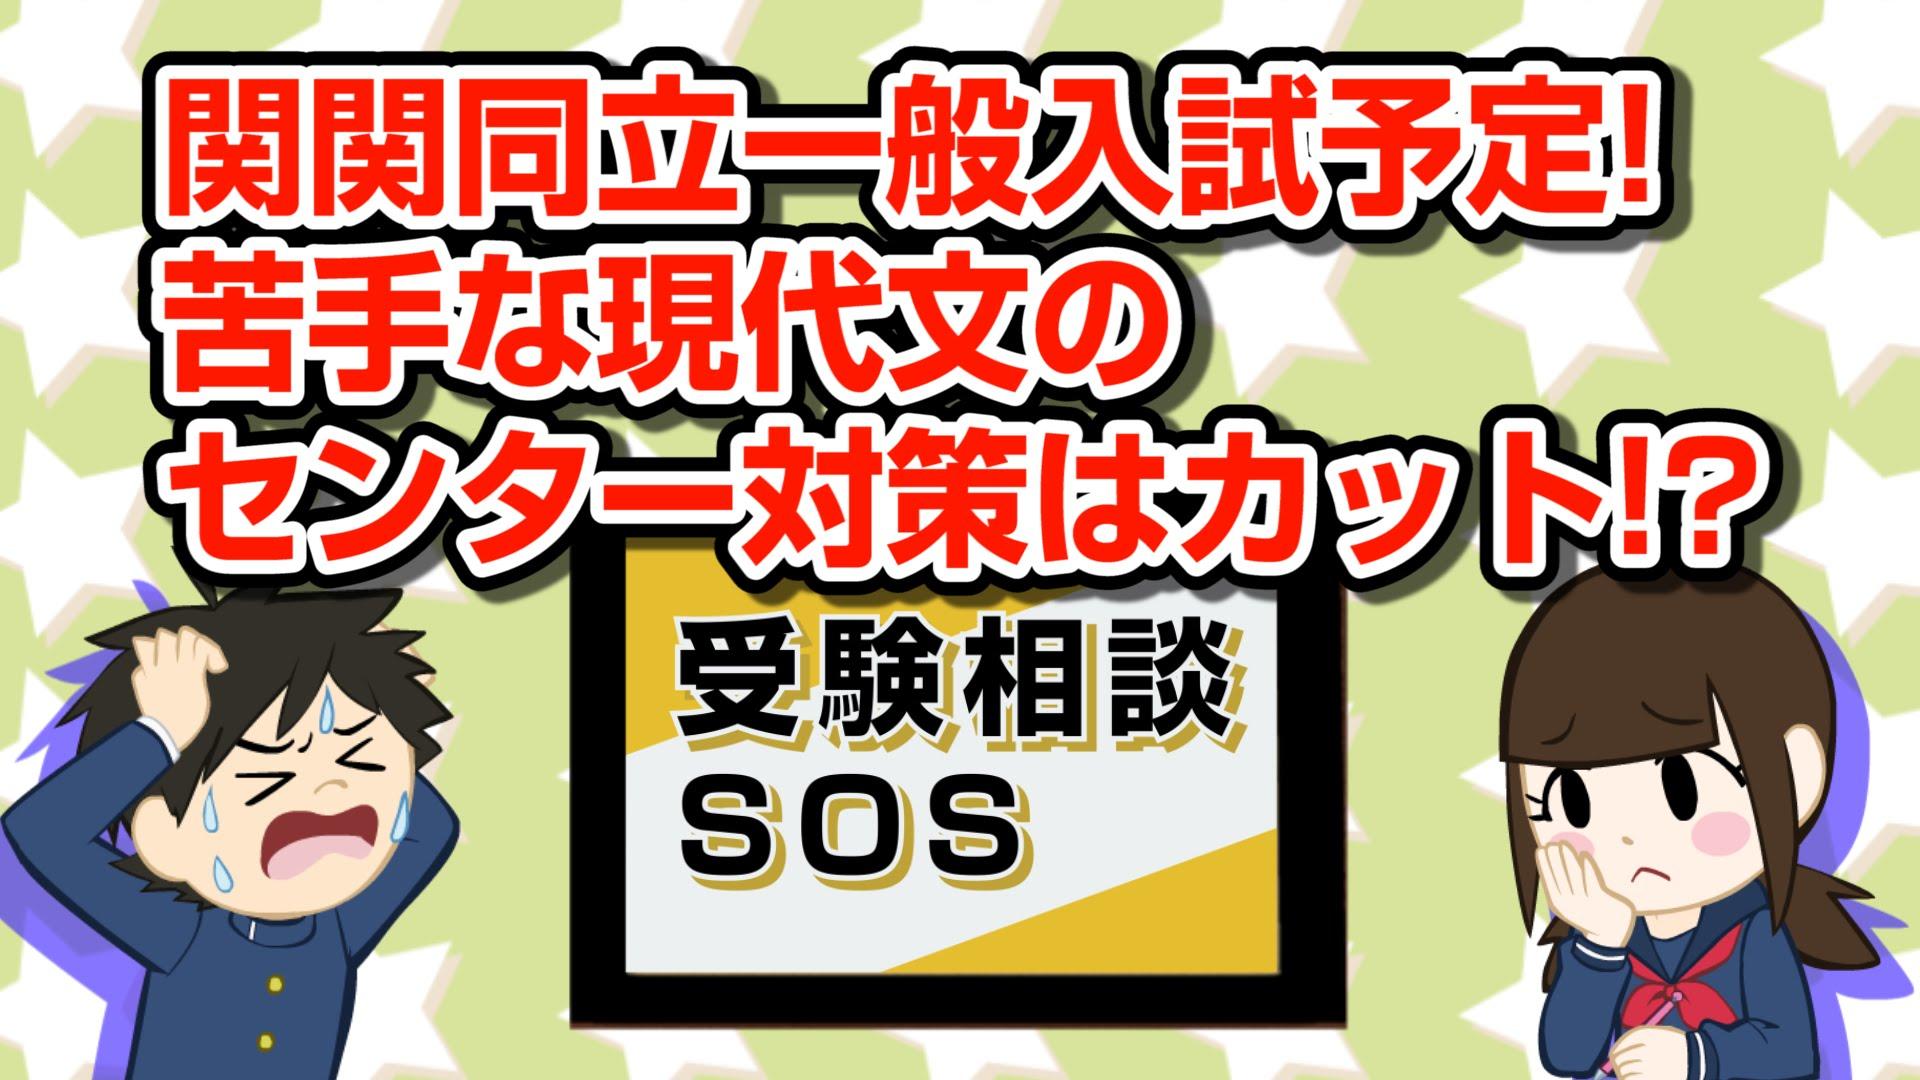 【vol.281】関関同立一般受験予定! 苦手な現代文のセンター対策はカットする!?|受験相談SOS